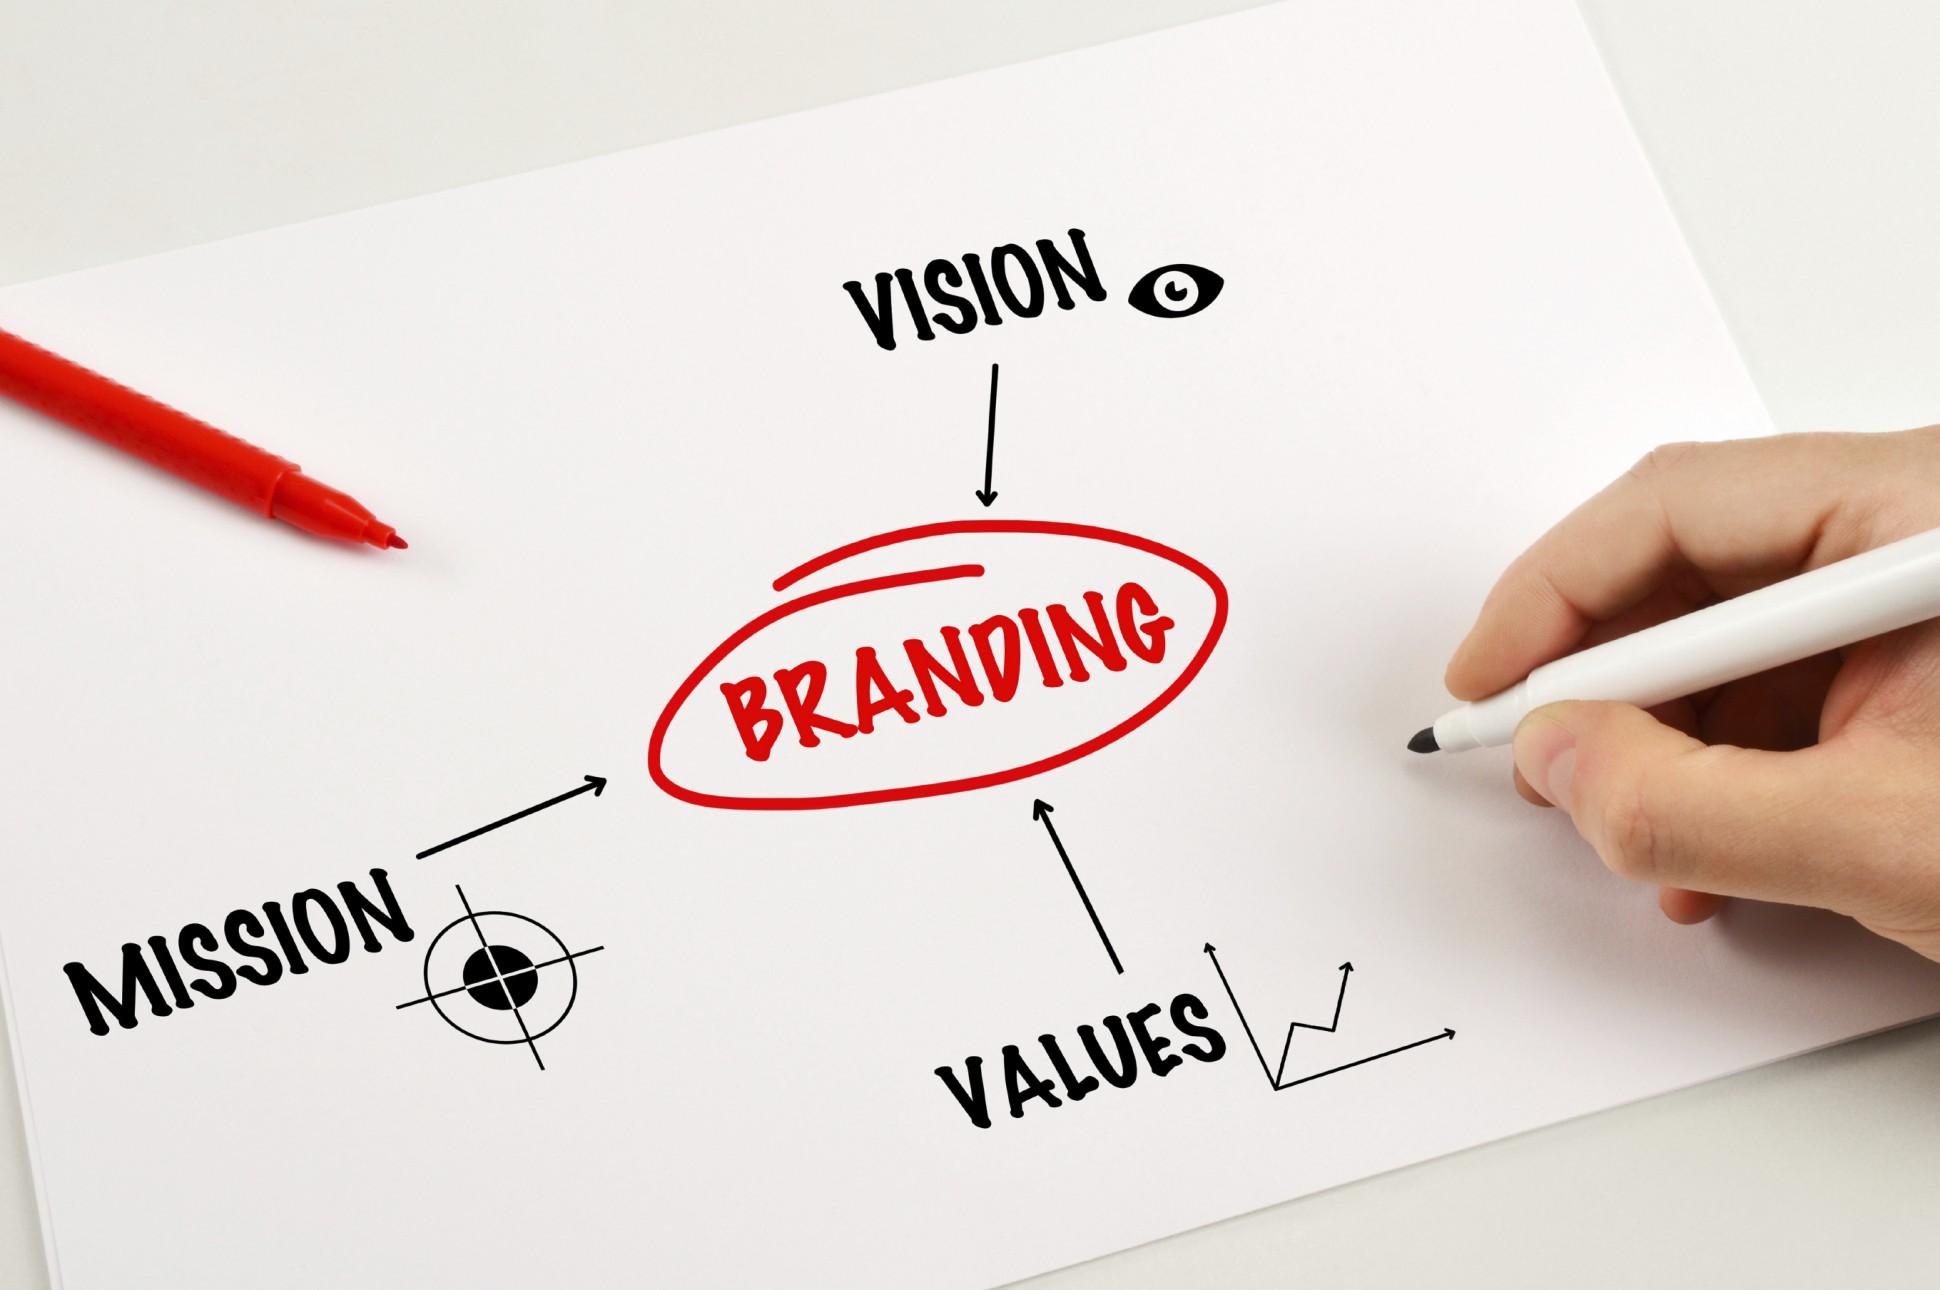 Branding Companies in Singapore - Providing Better Ways of Marketing And Branding